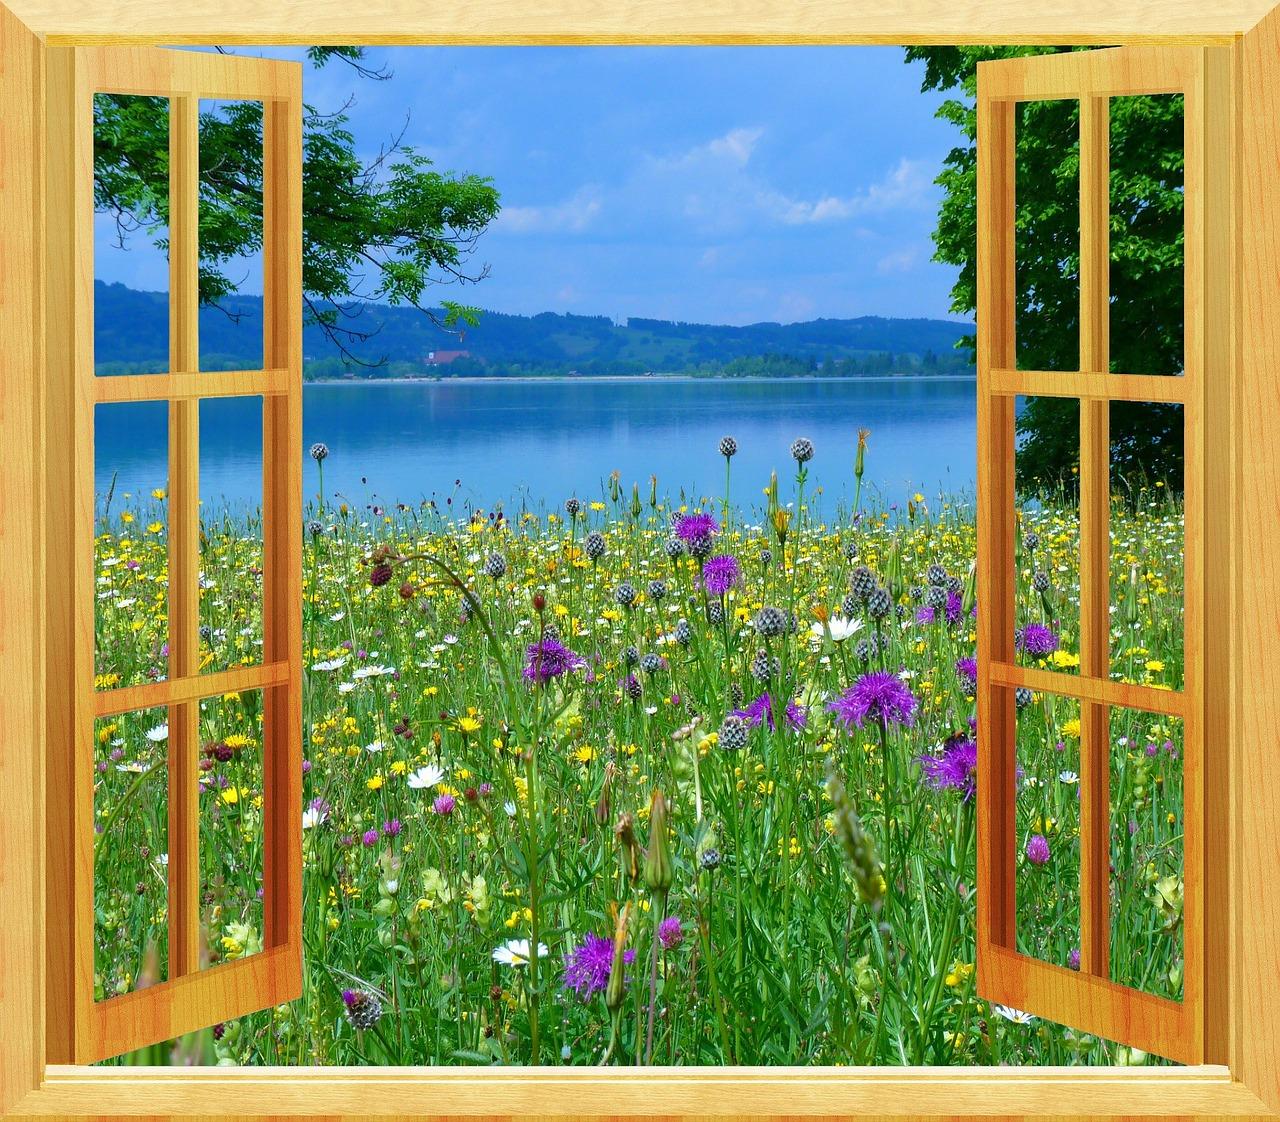 Картинки открытое окно летом